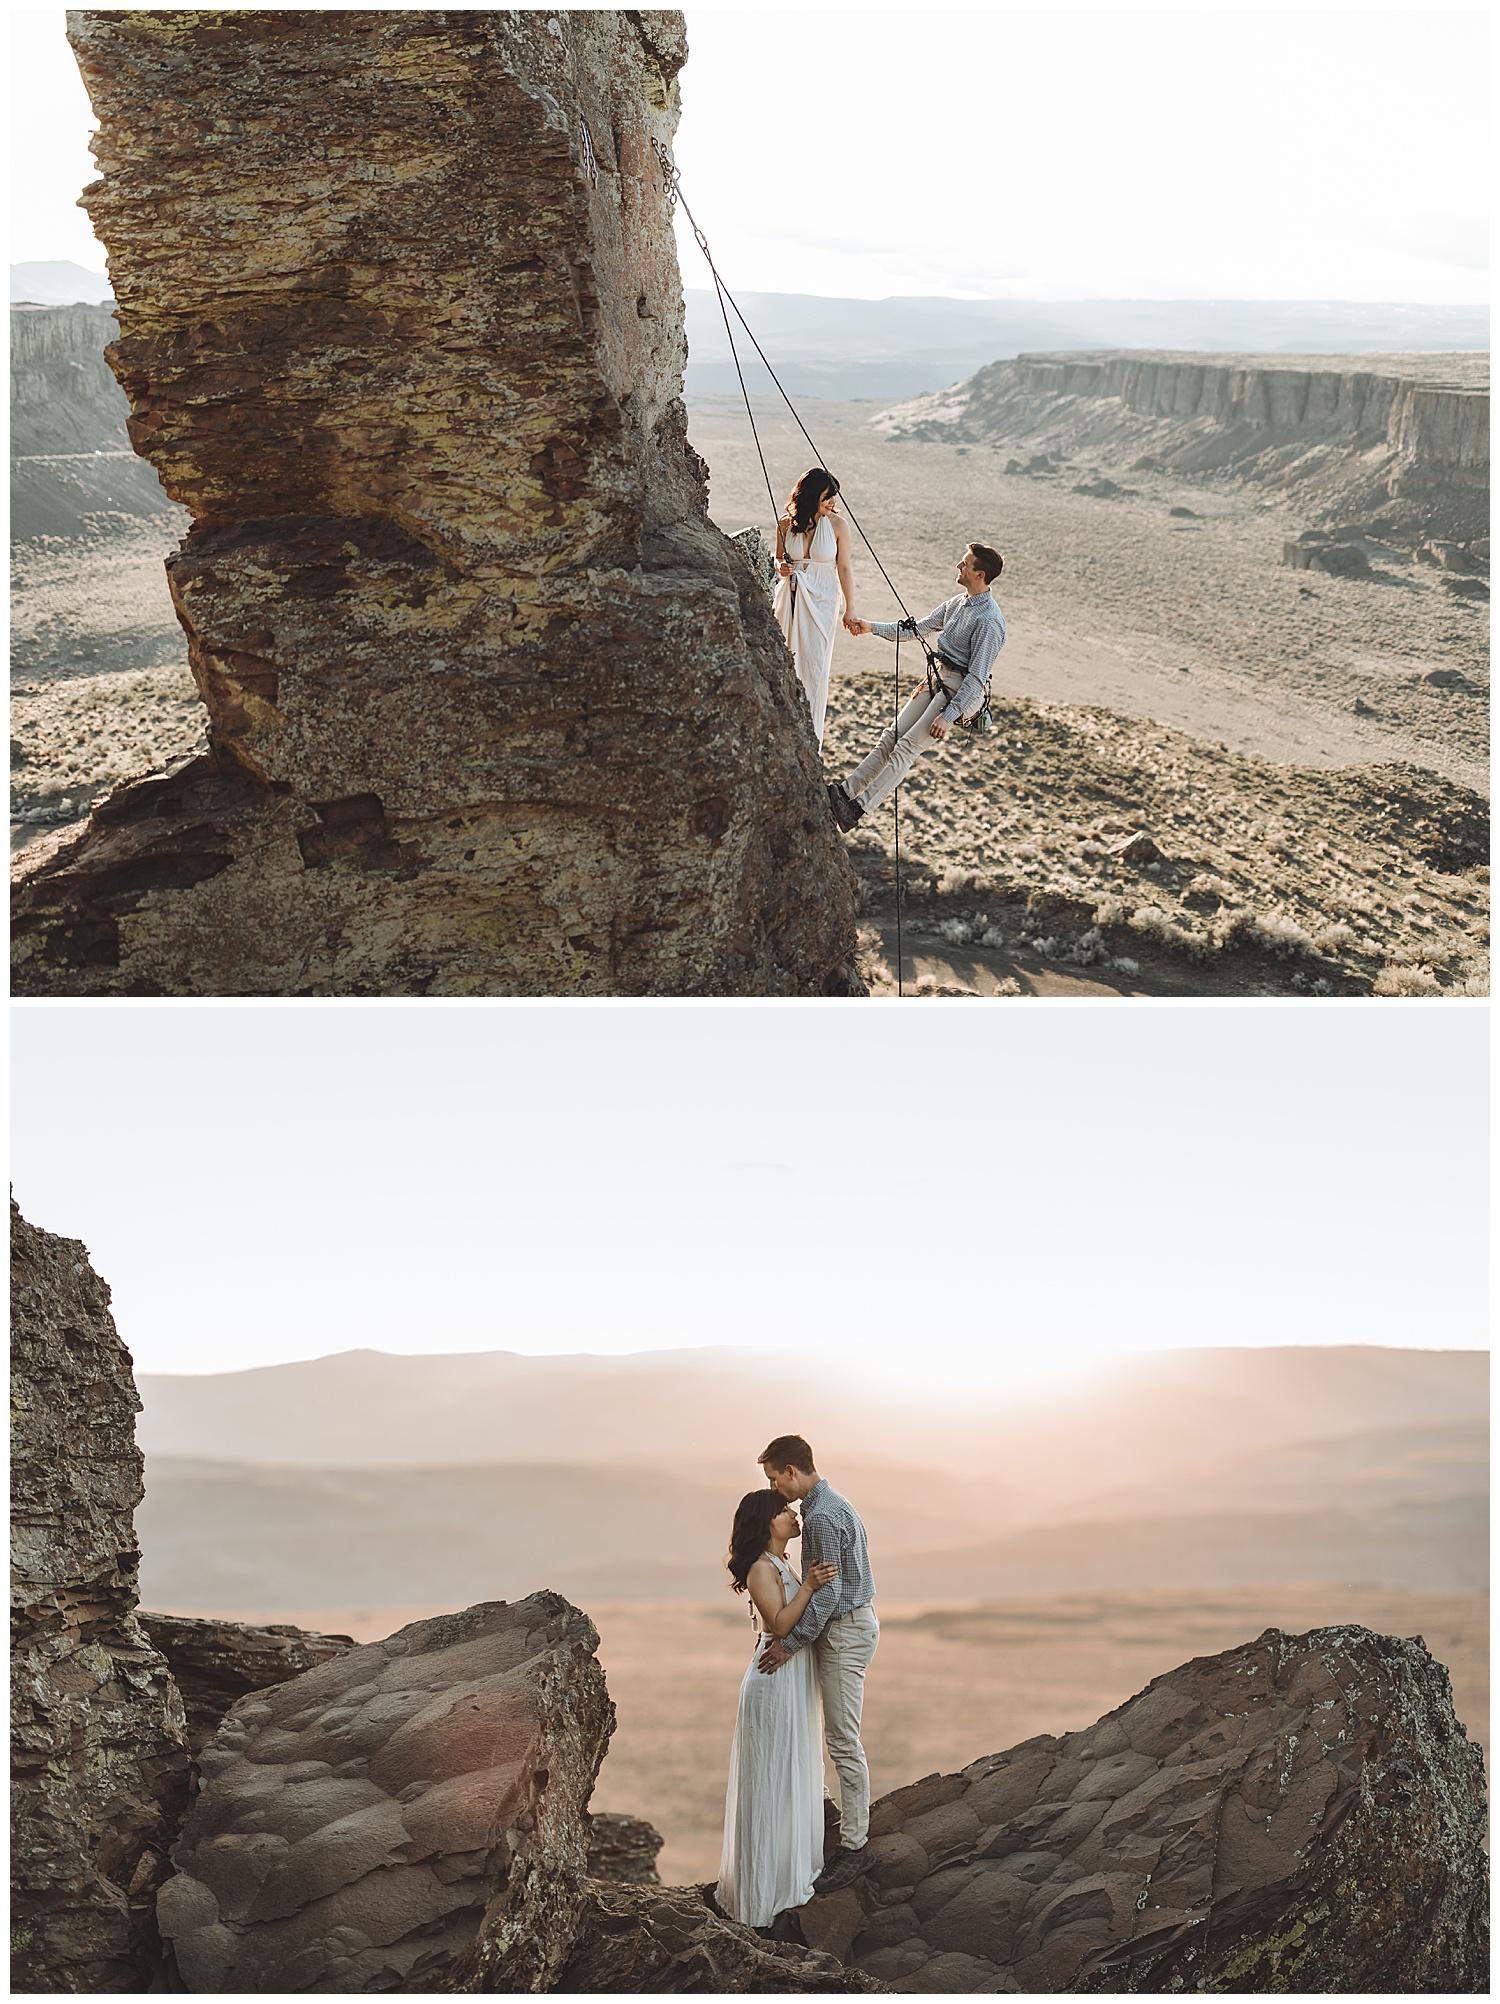 Rock-climbing-engagement-photo-shoot_Stephanie-Keegan-Photography_01.jpg